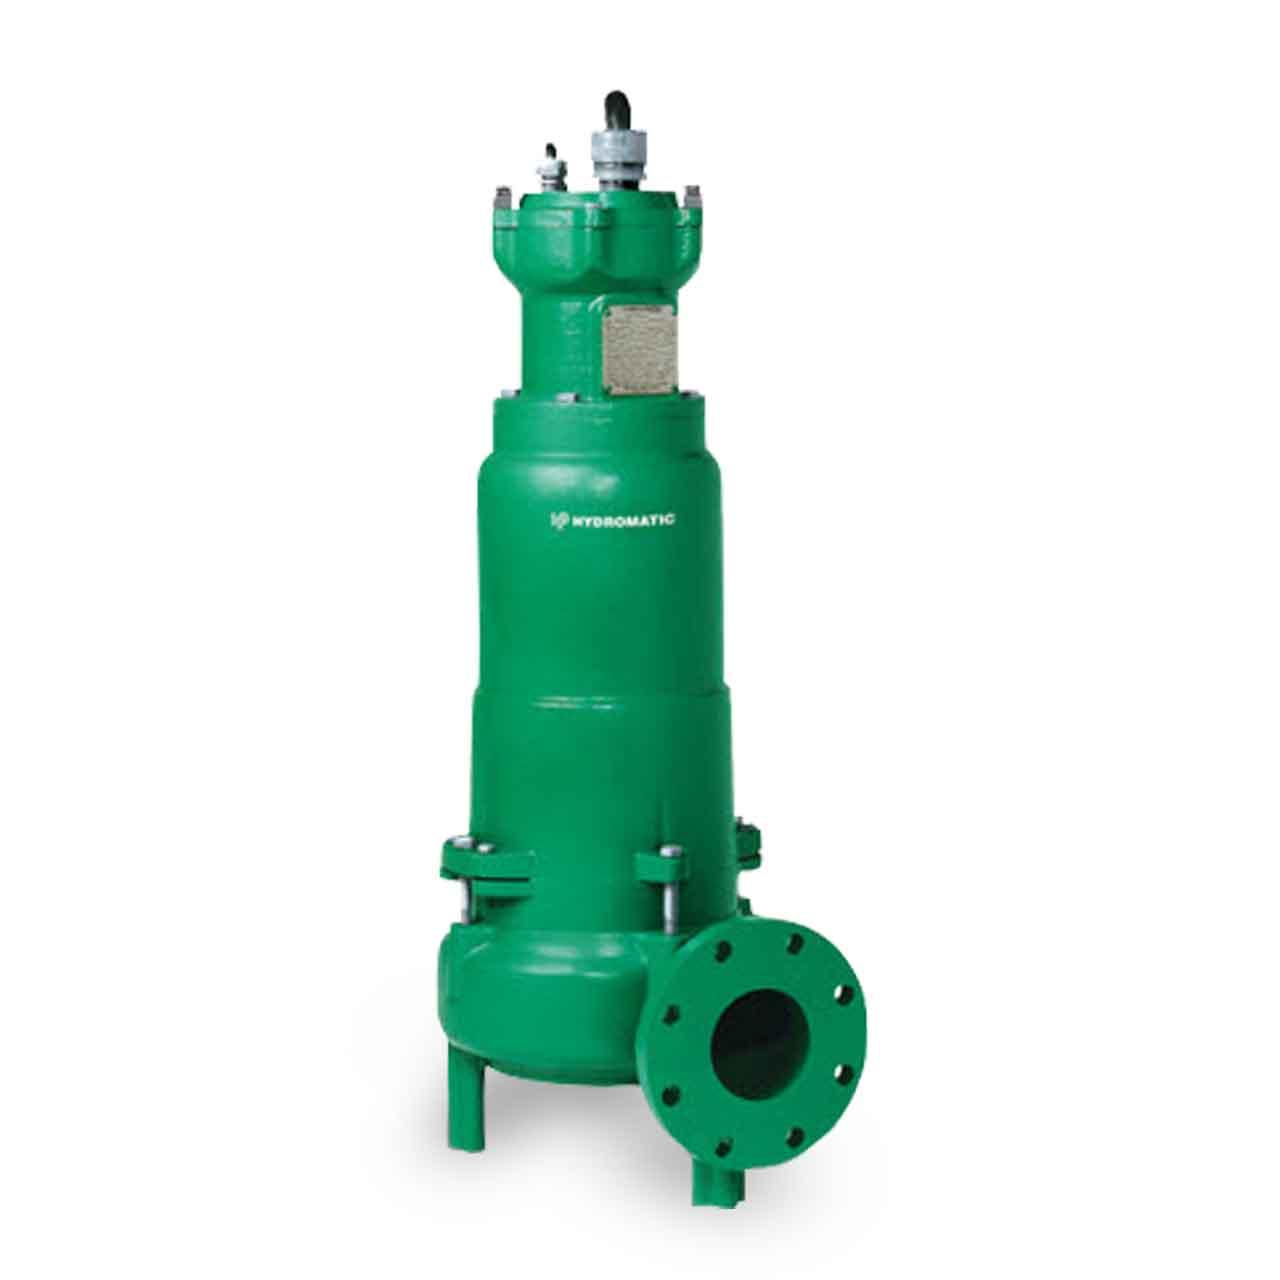 Hydromatic Pump Hydromatic S4p1000m4 4 Submersible